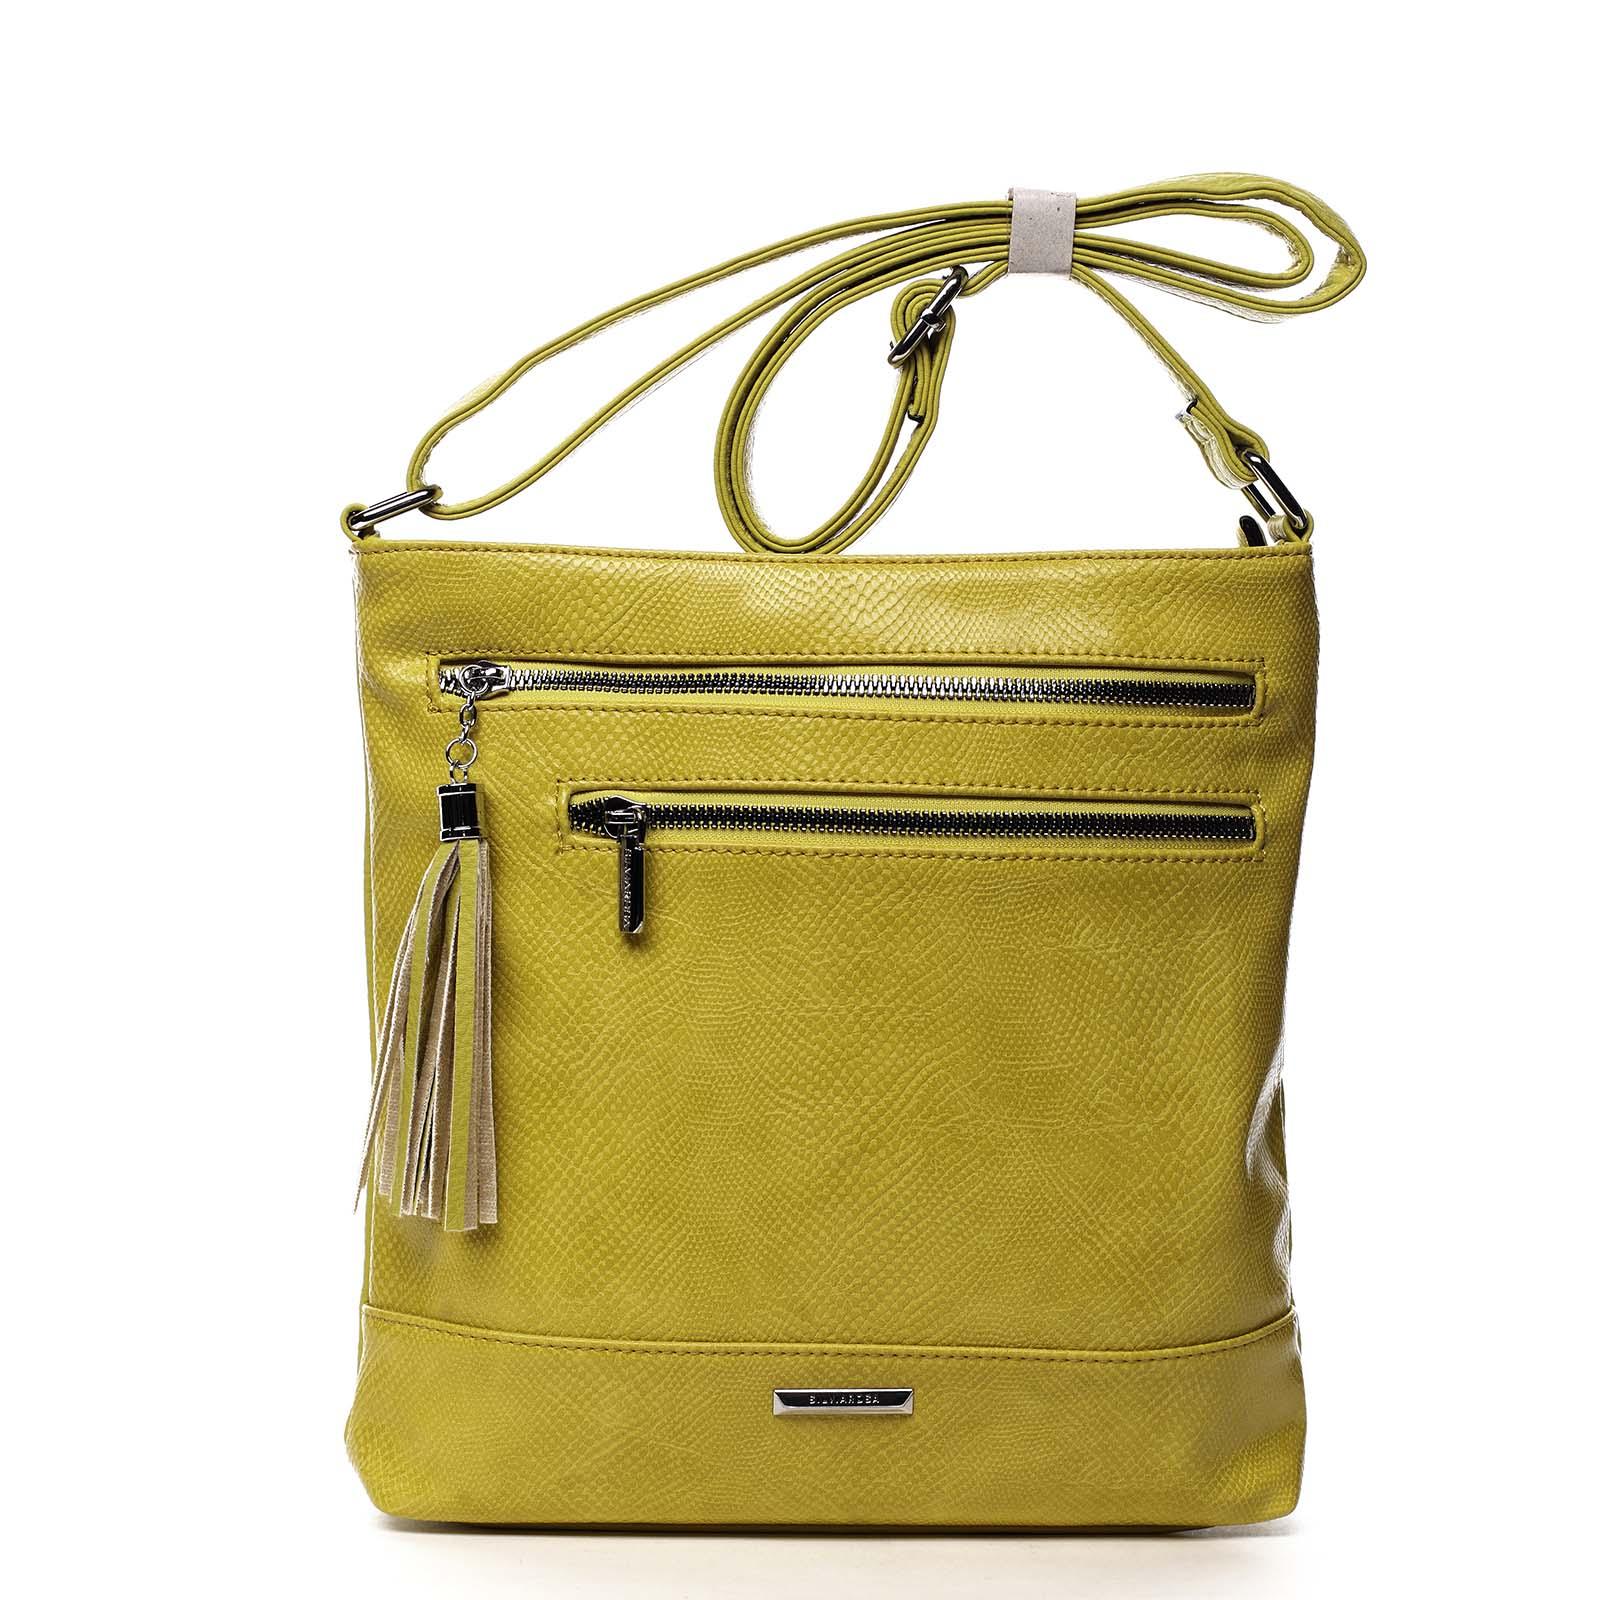 Dámská crossbody kabelky žlutá - Silvia Rosa Babena Snake